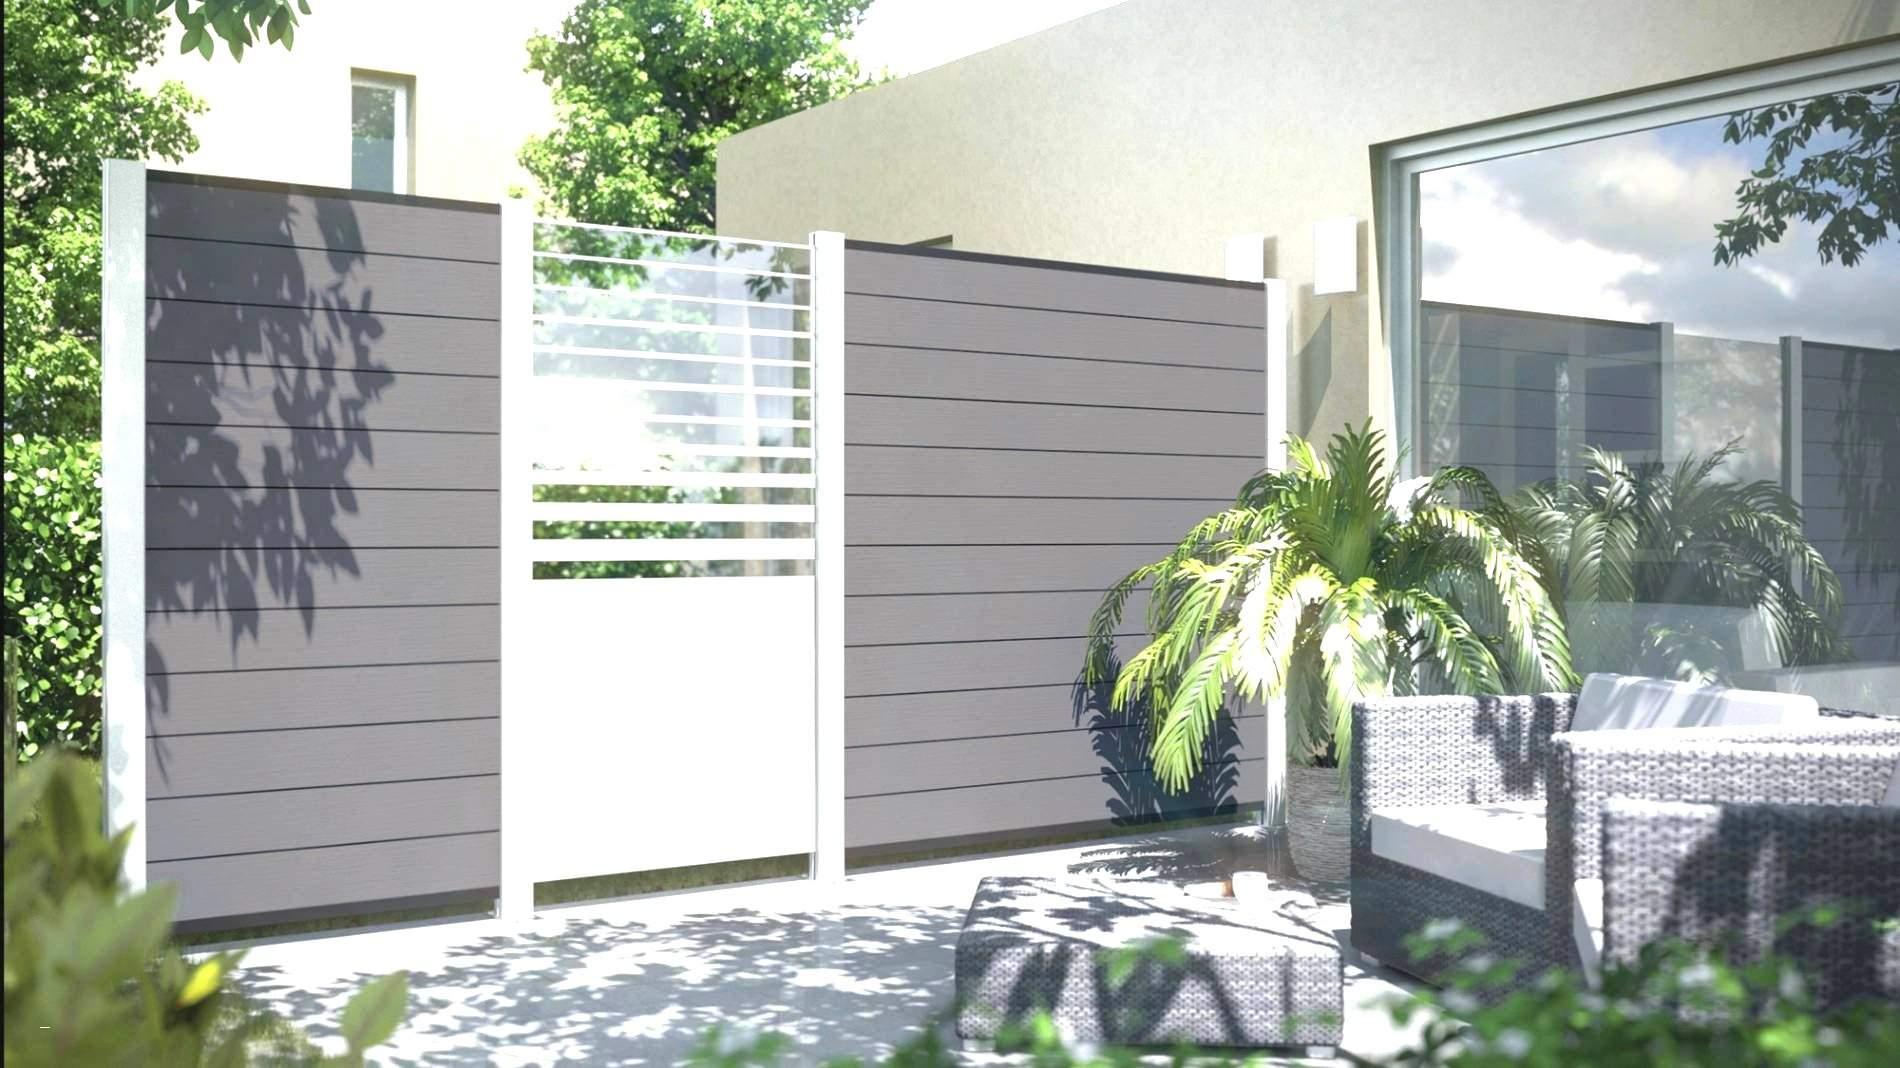 sonnenschutz balkon selber machen wohn design gebietend balkon sichtschutz selber machen